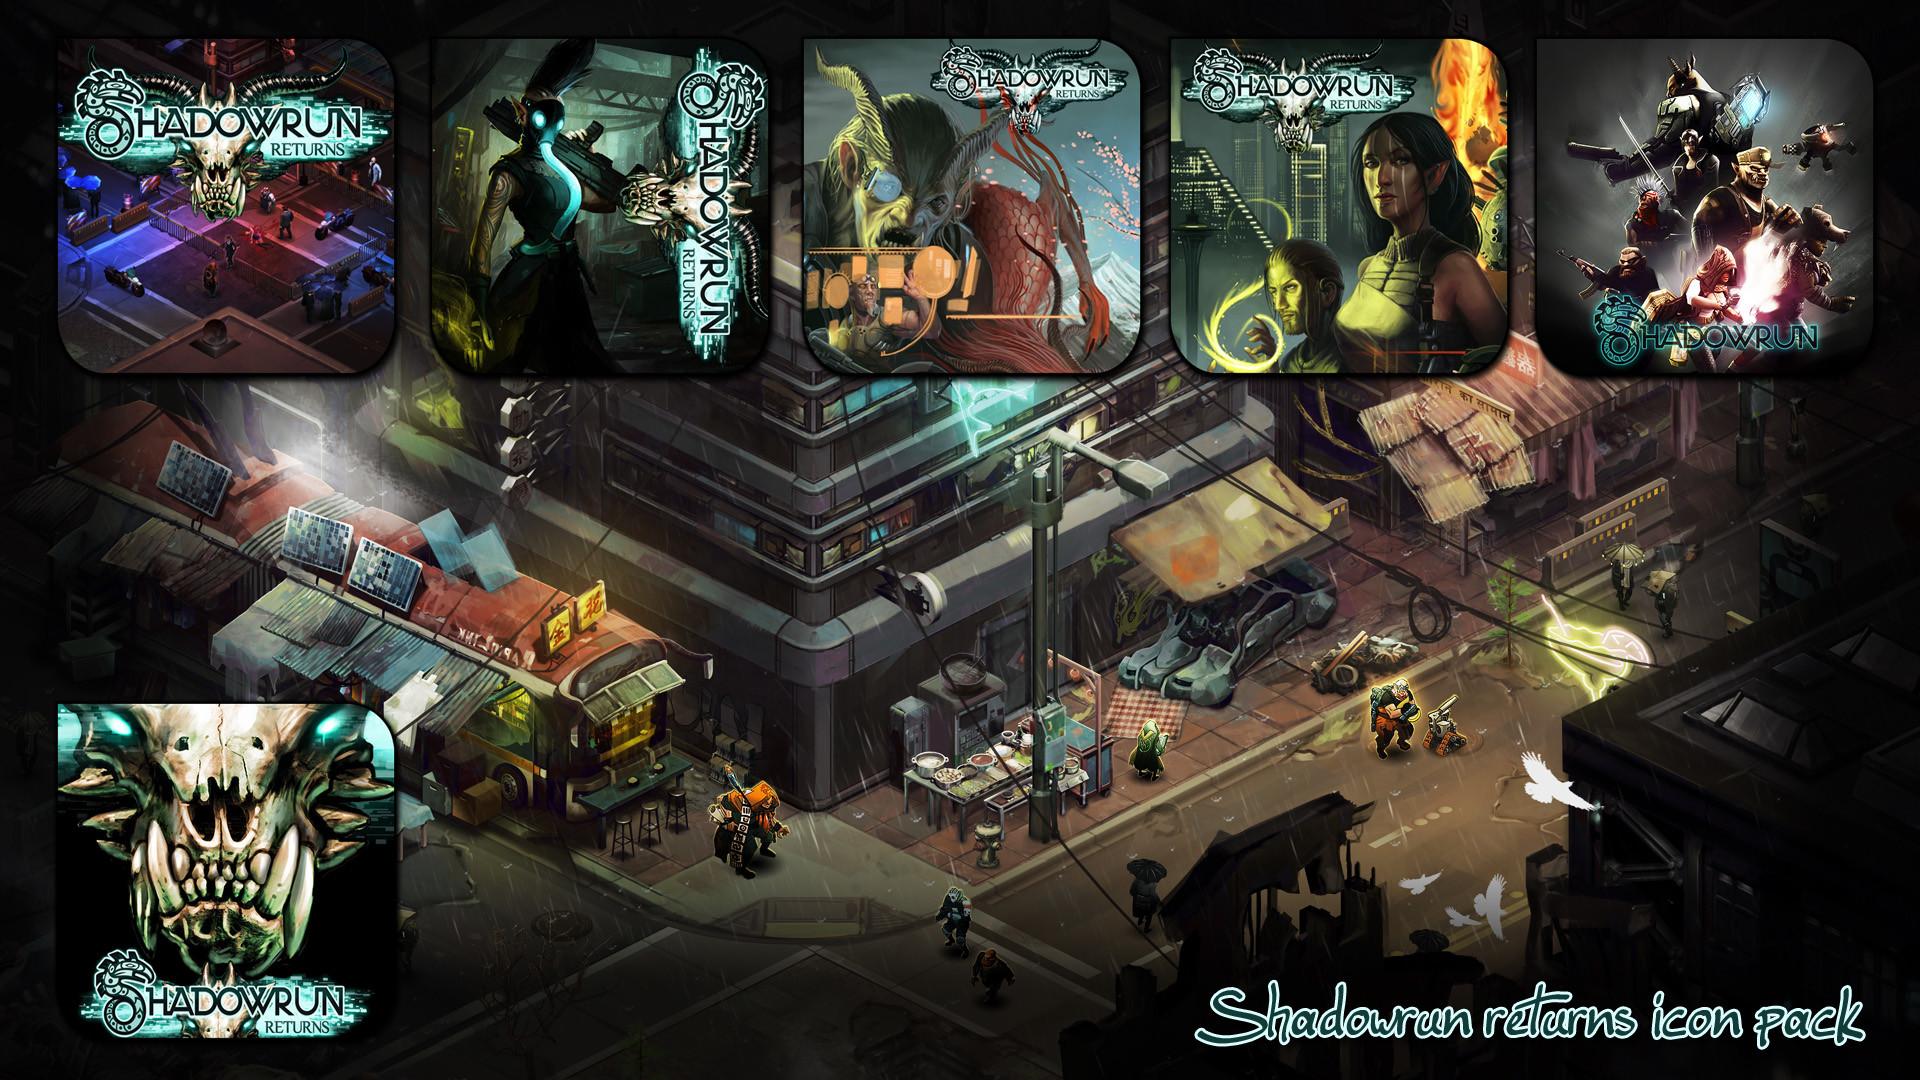 Shadowrun Returns icon pack by Kalca Shadowrun Returns icon pack by Kalca